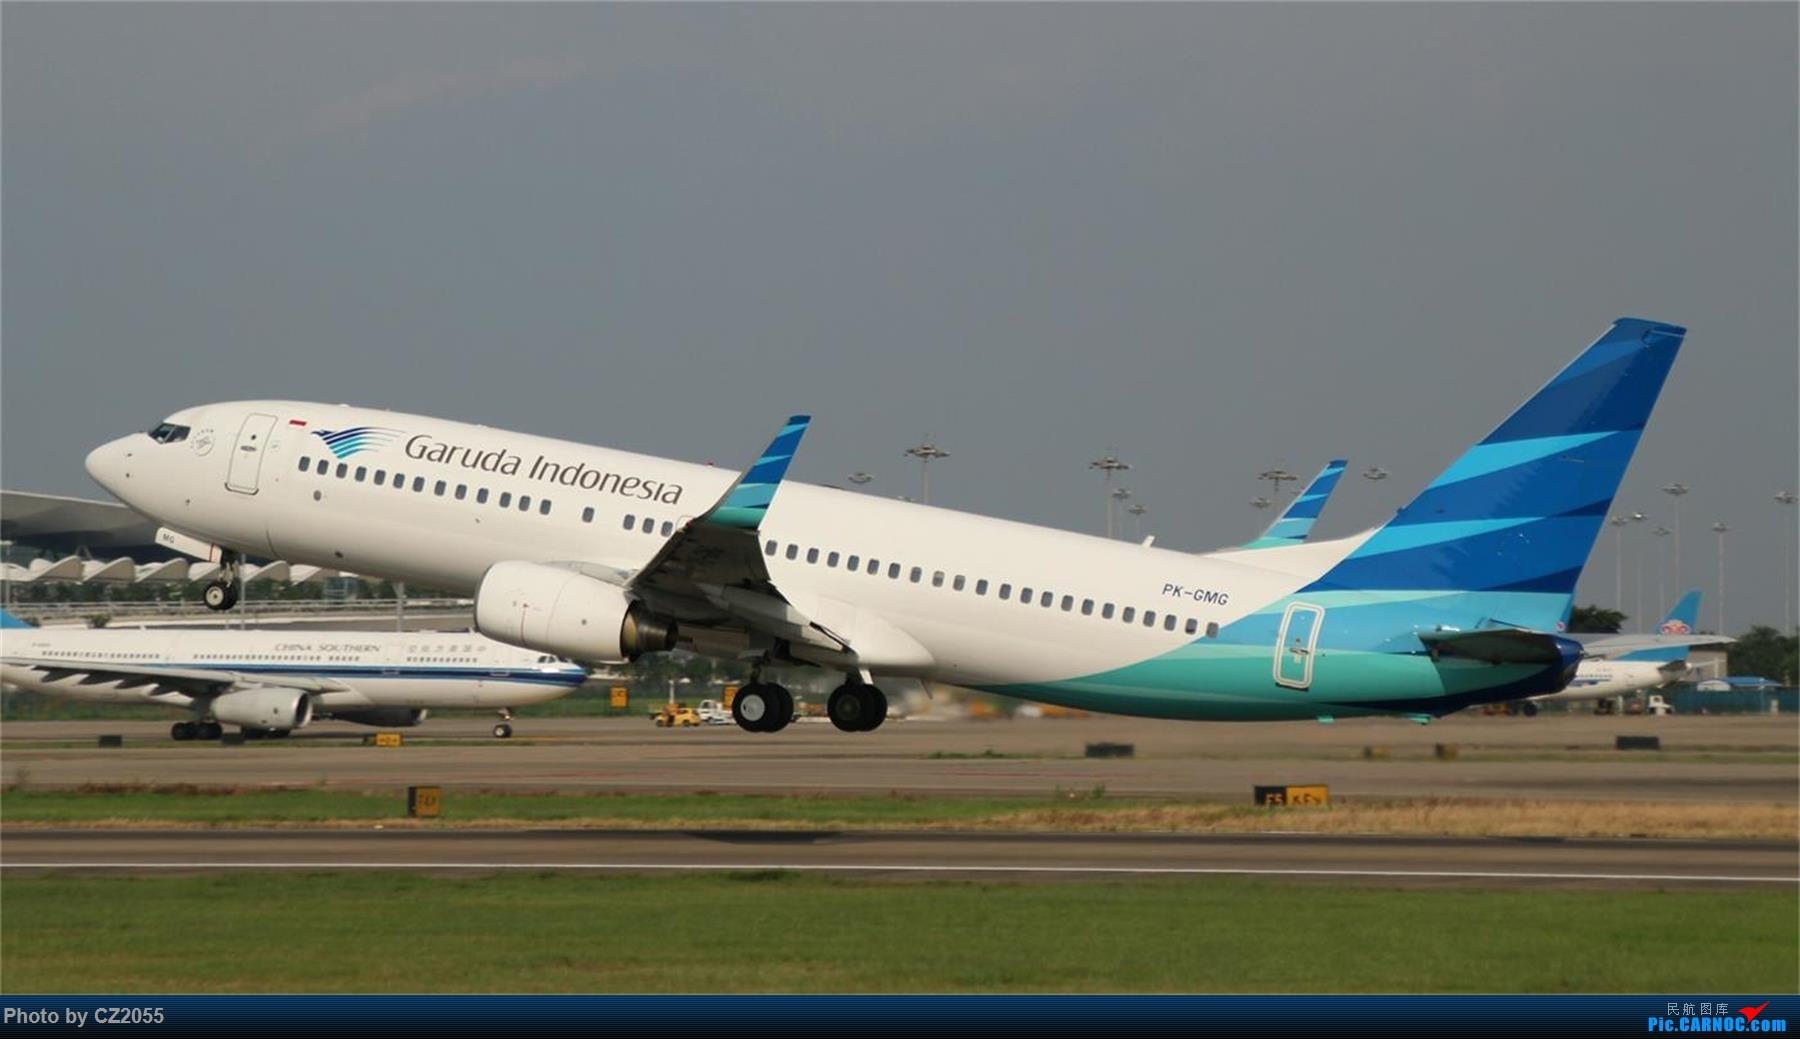 Re:[原创][原创]【CZ2055】【CAN】新镜头试镜。 BOEING 737-800 PK-GMG 中国广州白云国际机场